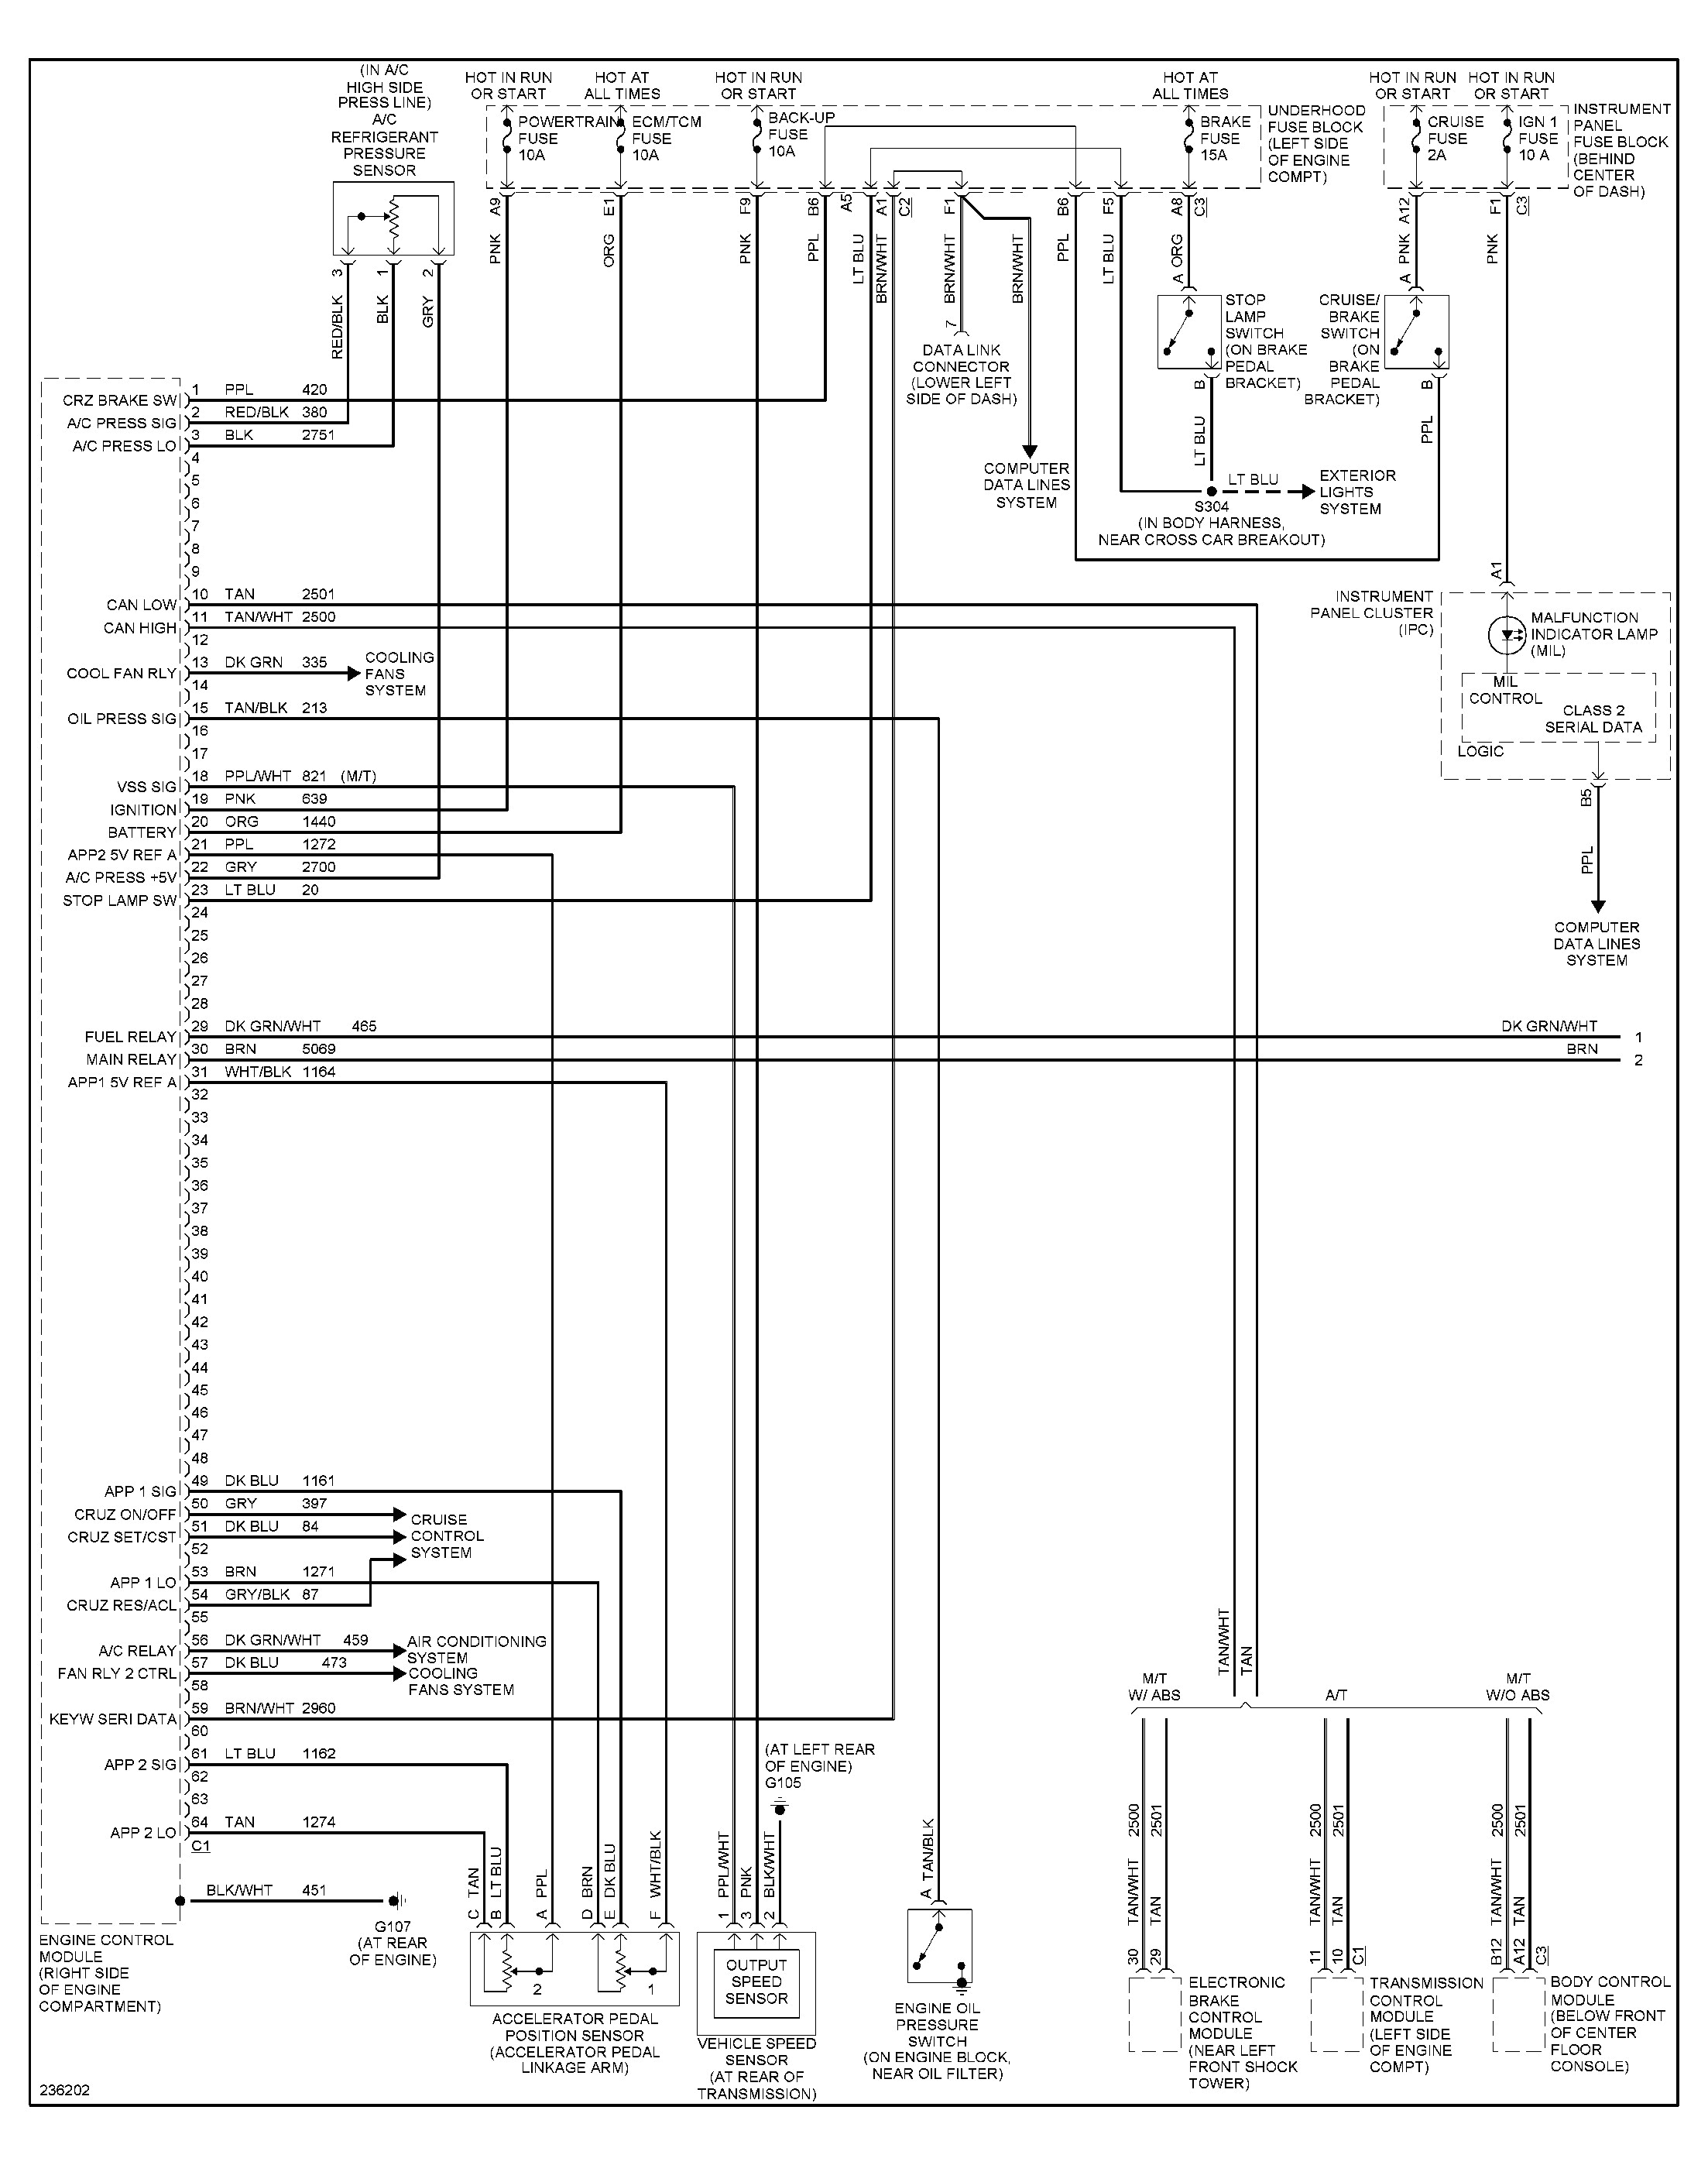 saturn engine wiring diagram another blog about wiring diagram 2000 saturn engine wiring harness hecho